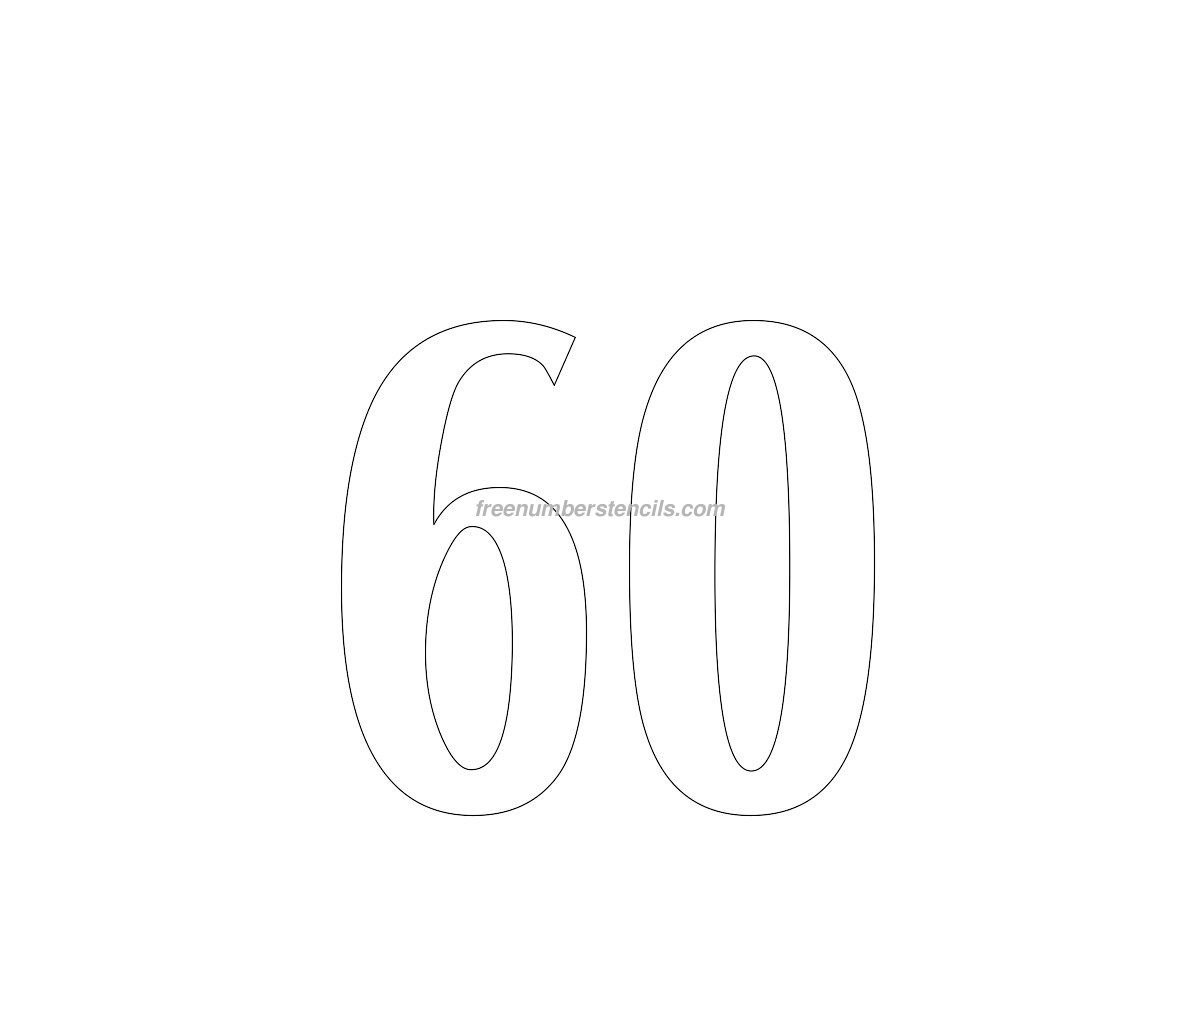 Free House 60 Number Stencil Freenumberstencils